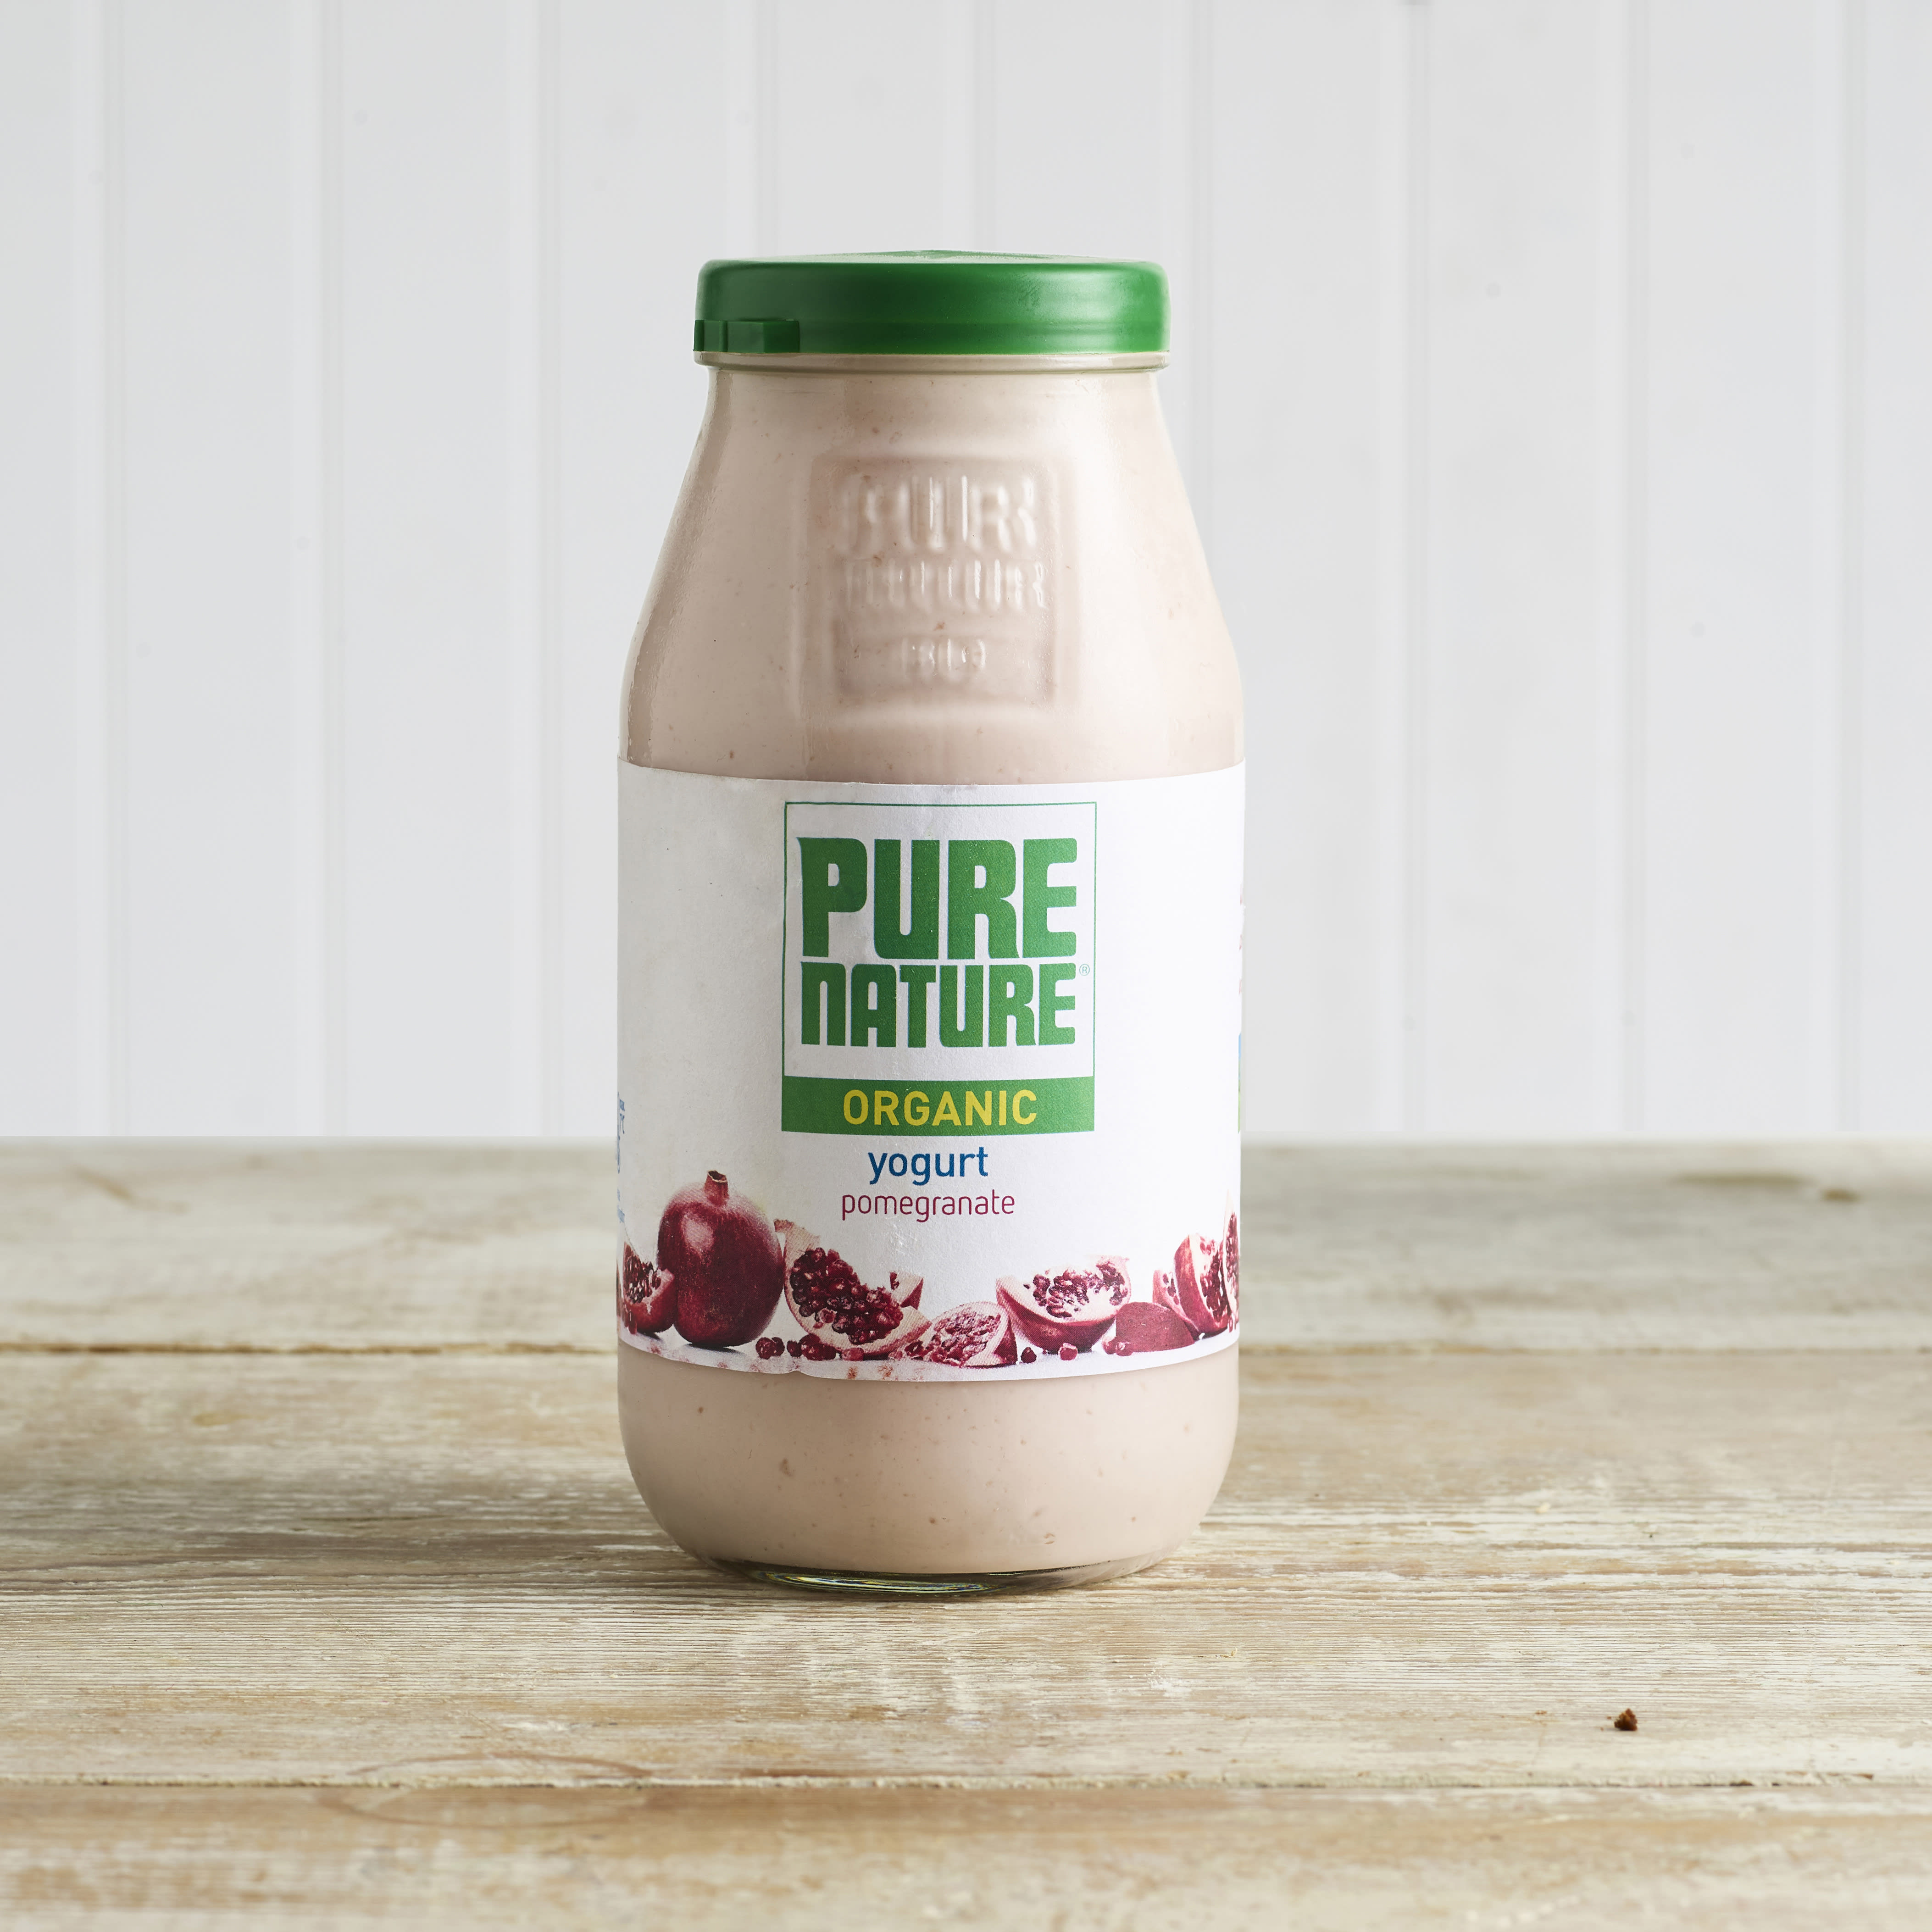 Pure Nature Organic Pomegranate Yoghurt in Glass, 500g